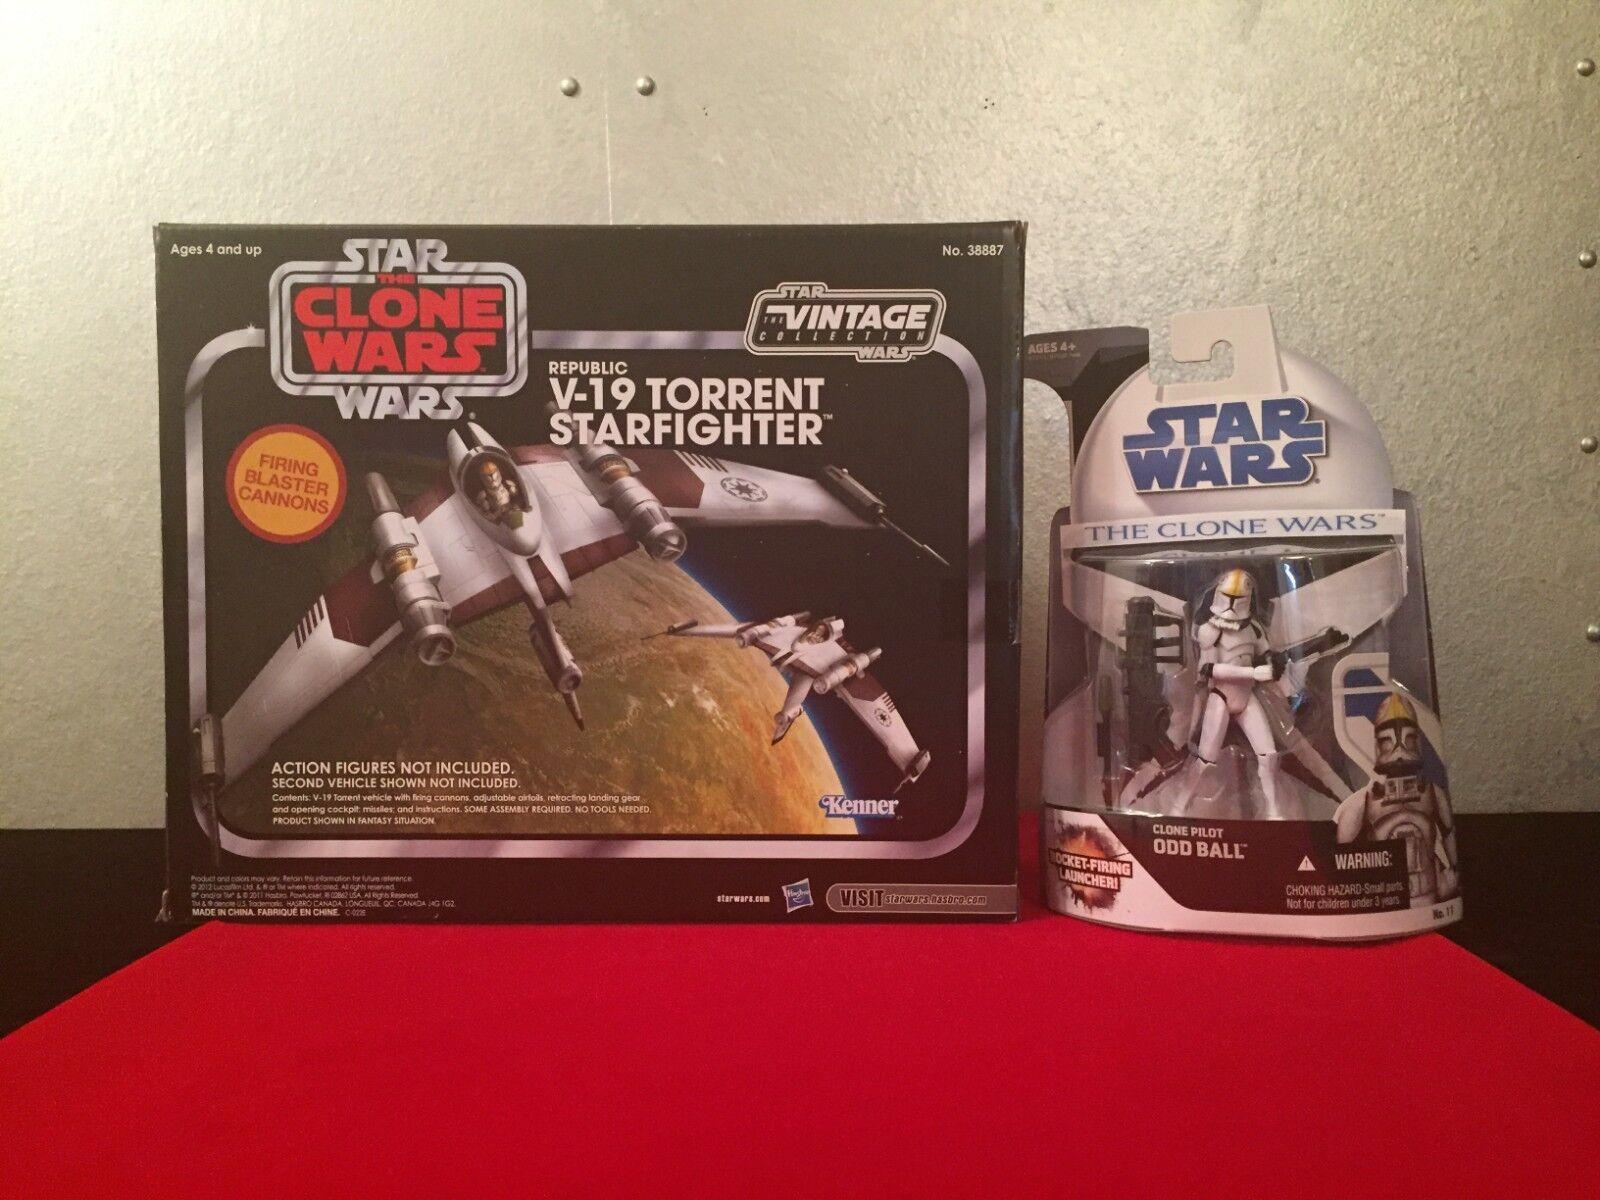 Star wars - vintage - kollektion v-19 torrent - & - pilot viel nib - noc.